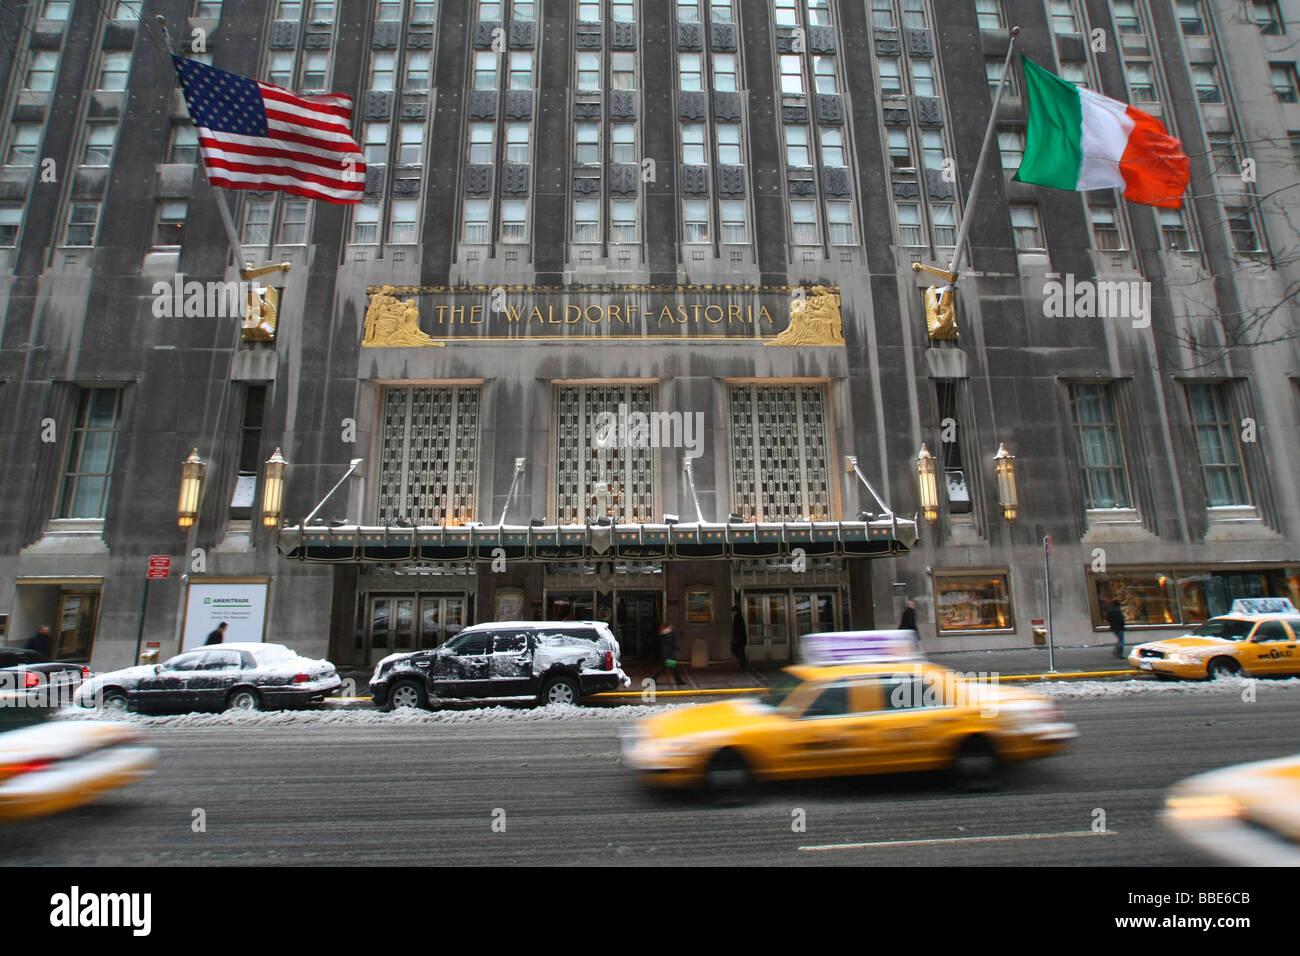 Waldorf-Astoria, hotel, Midtown, NYC, Manhattan, New York City, USA, United States of America - Stock Image